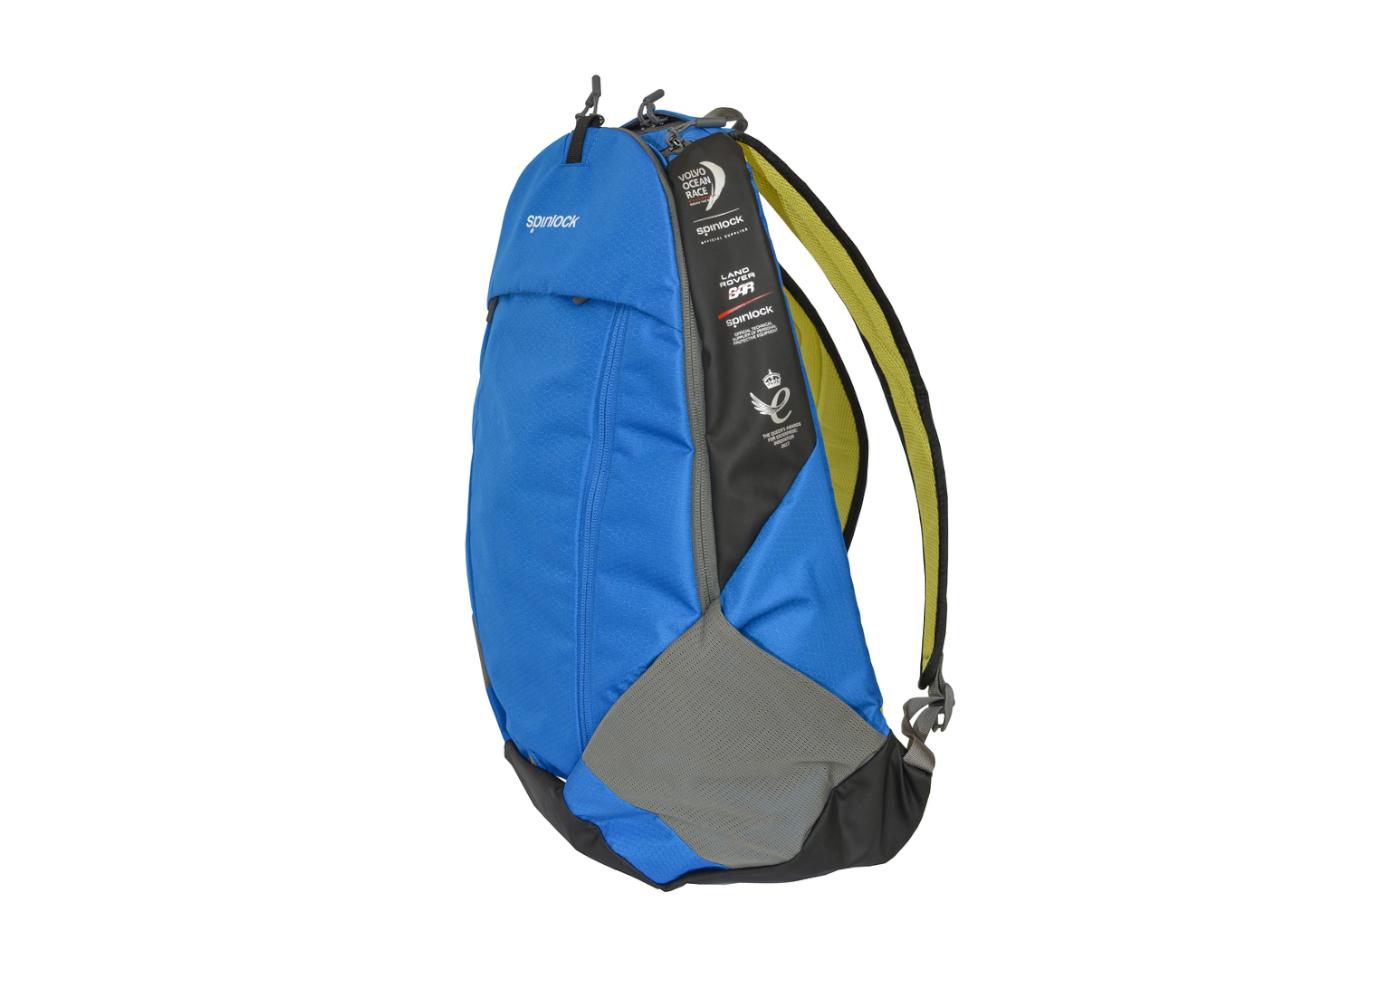 Deckpack 27L